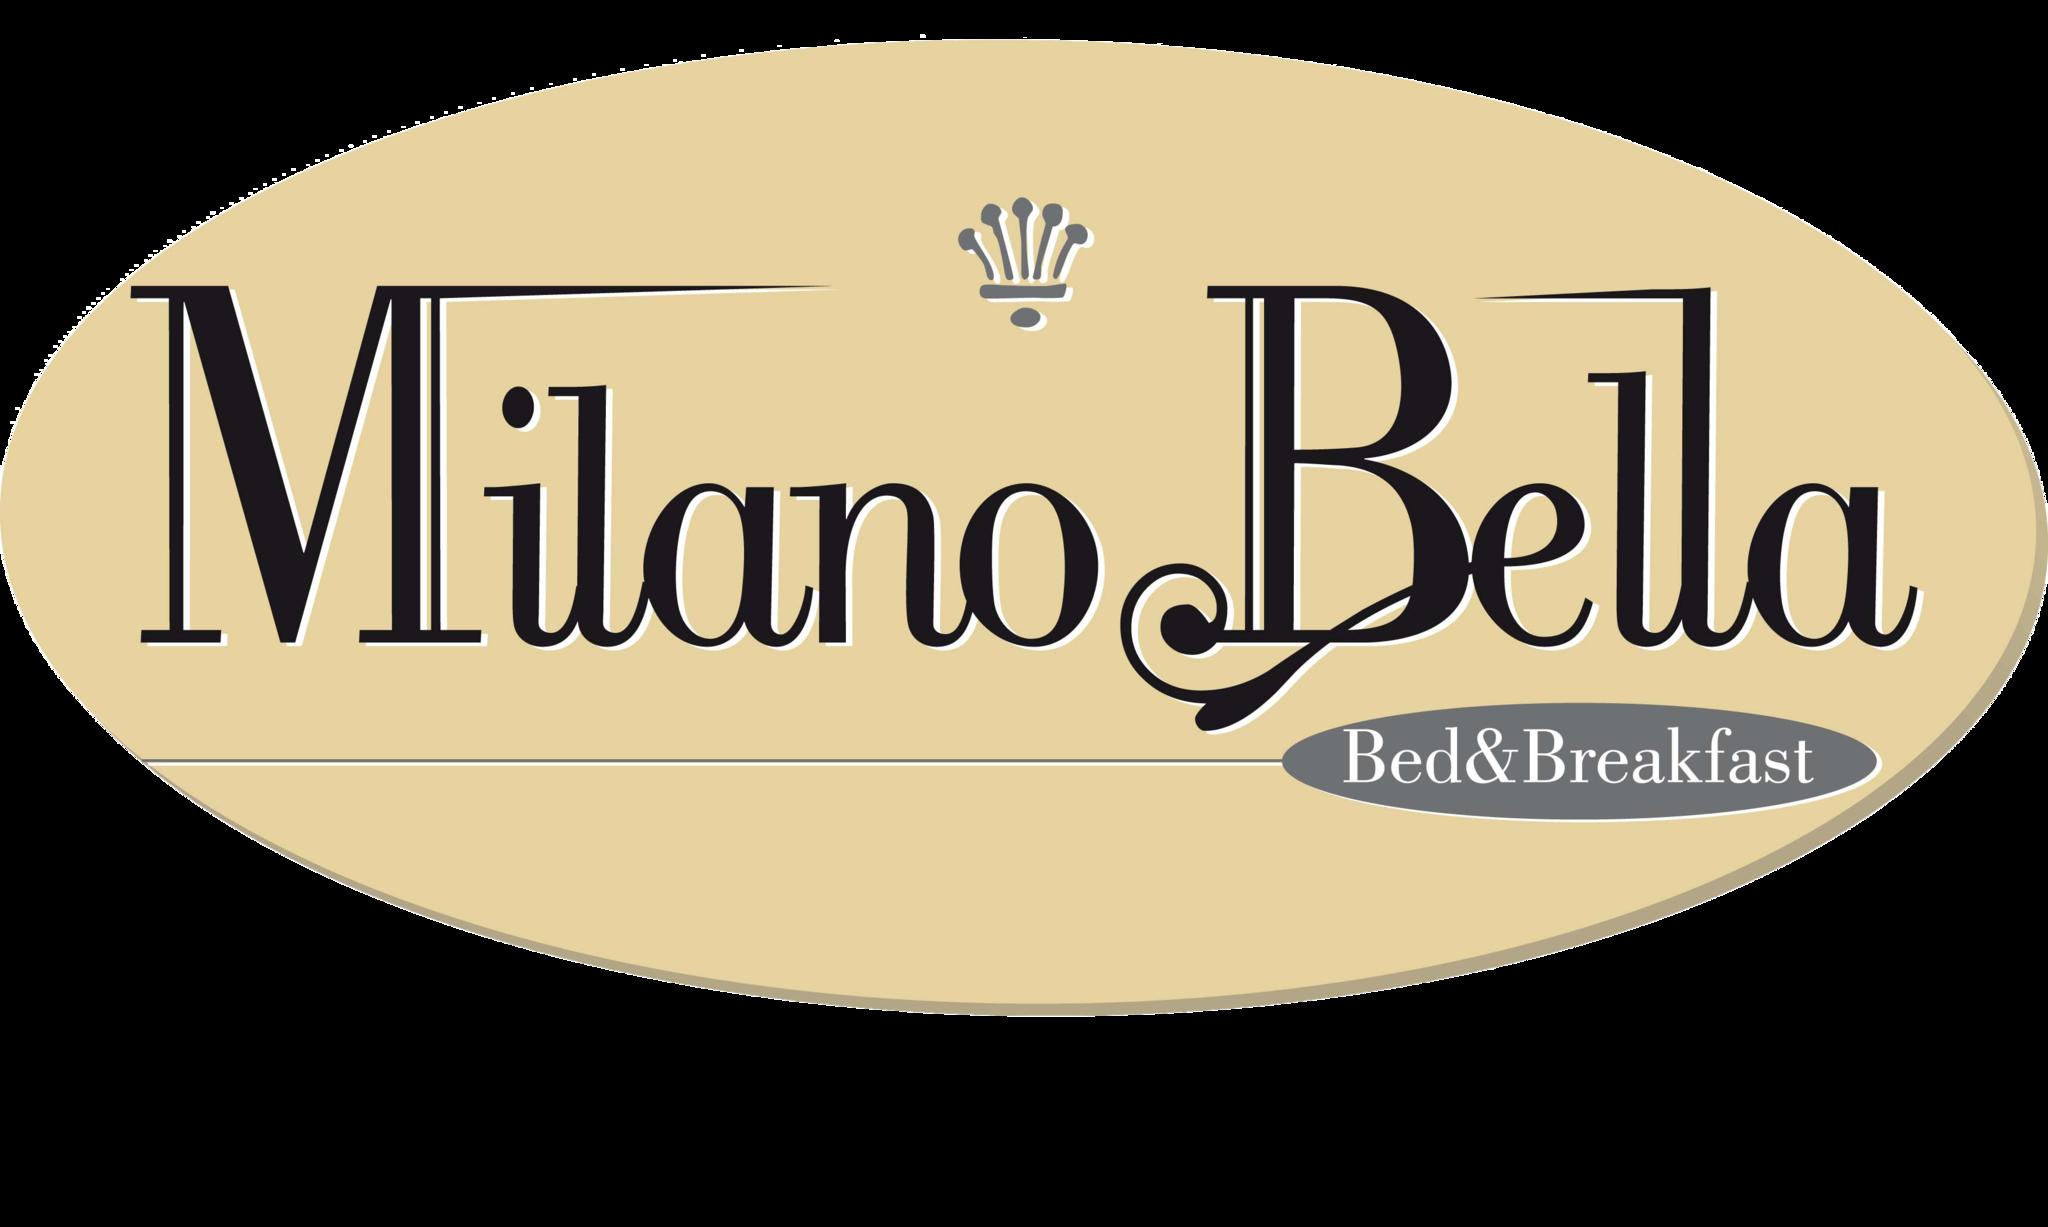 B&B 밀라노 벨라